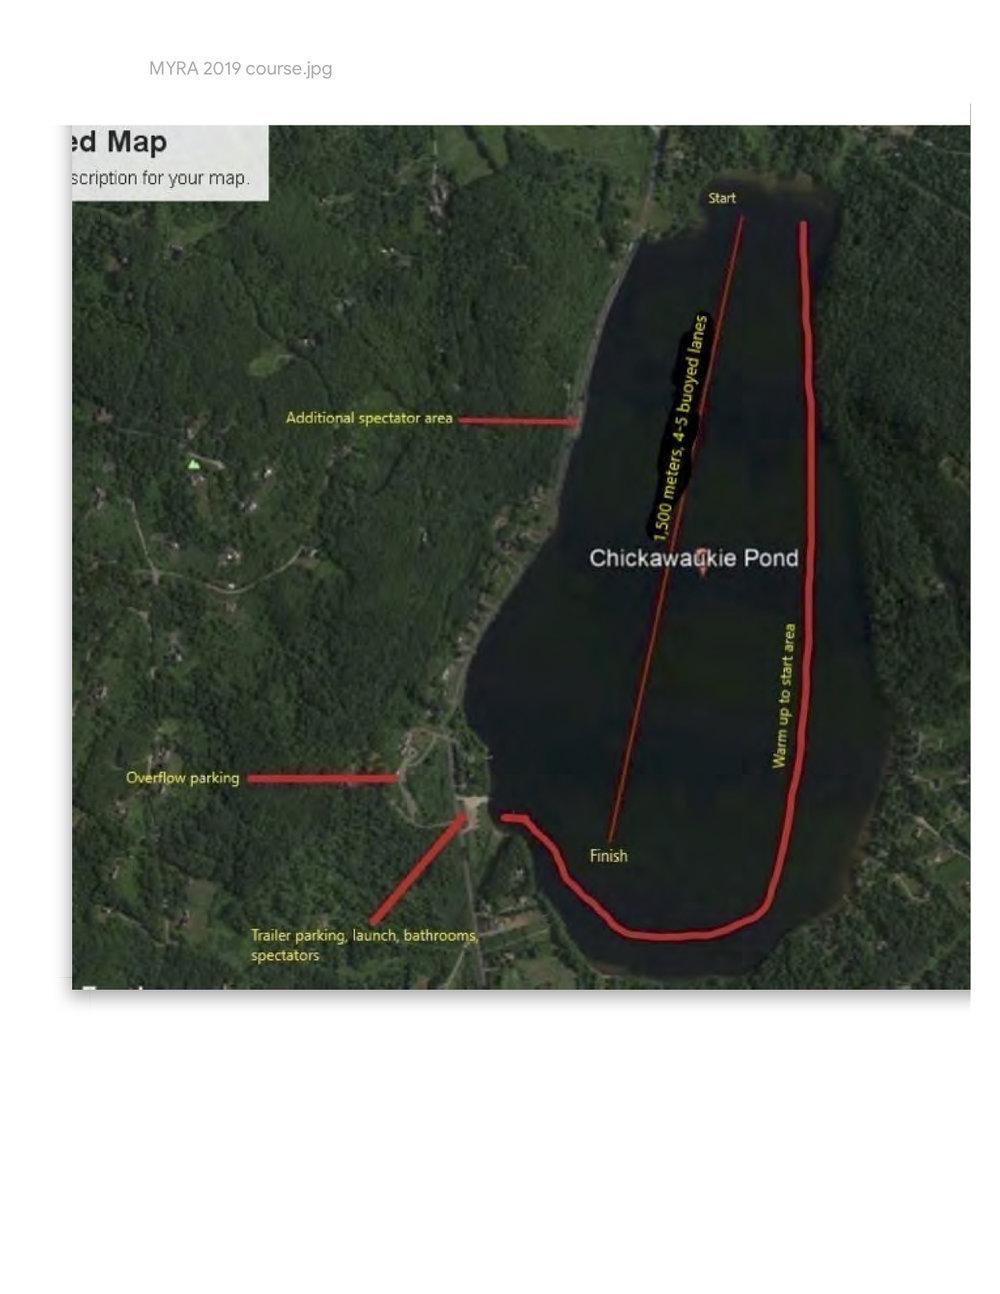 Chickawaukee Pond by Air course_2_pdf.jpg